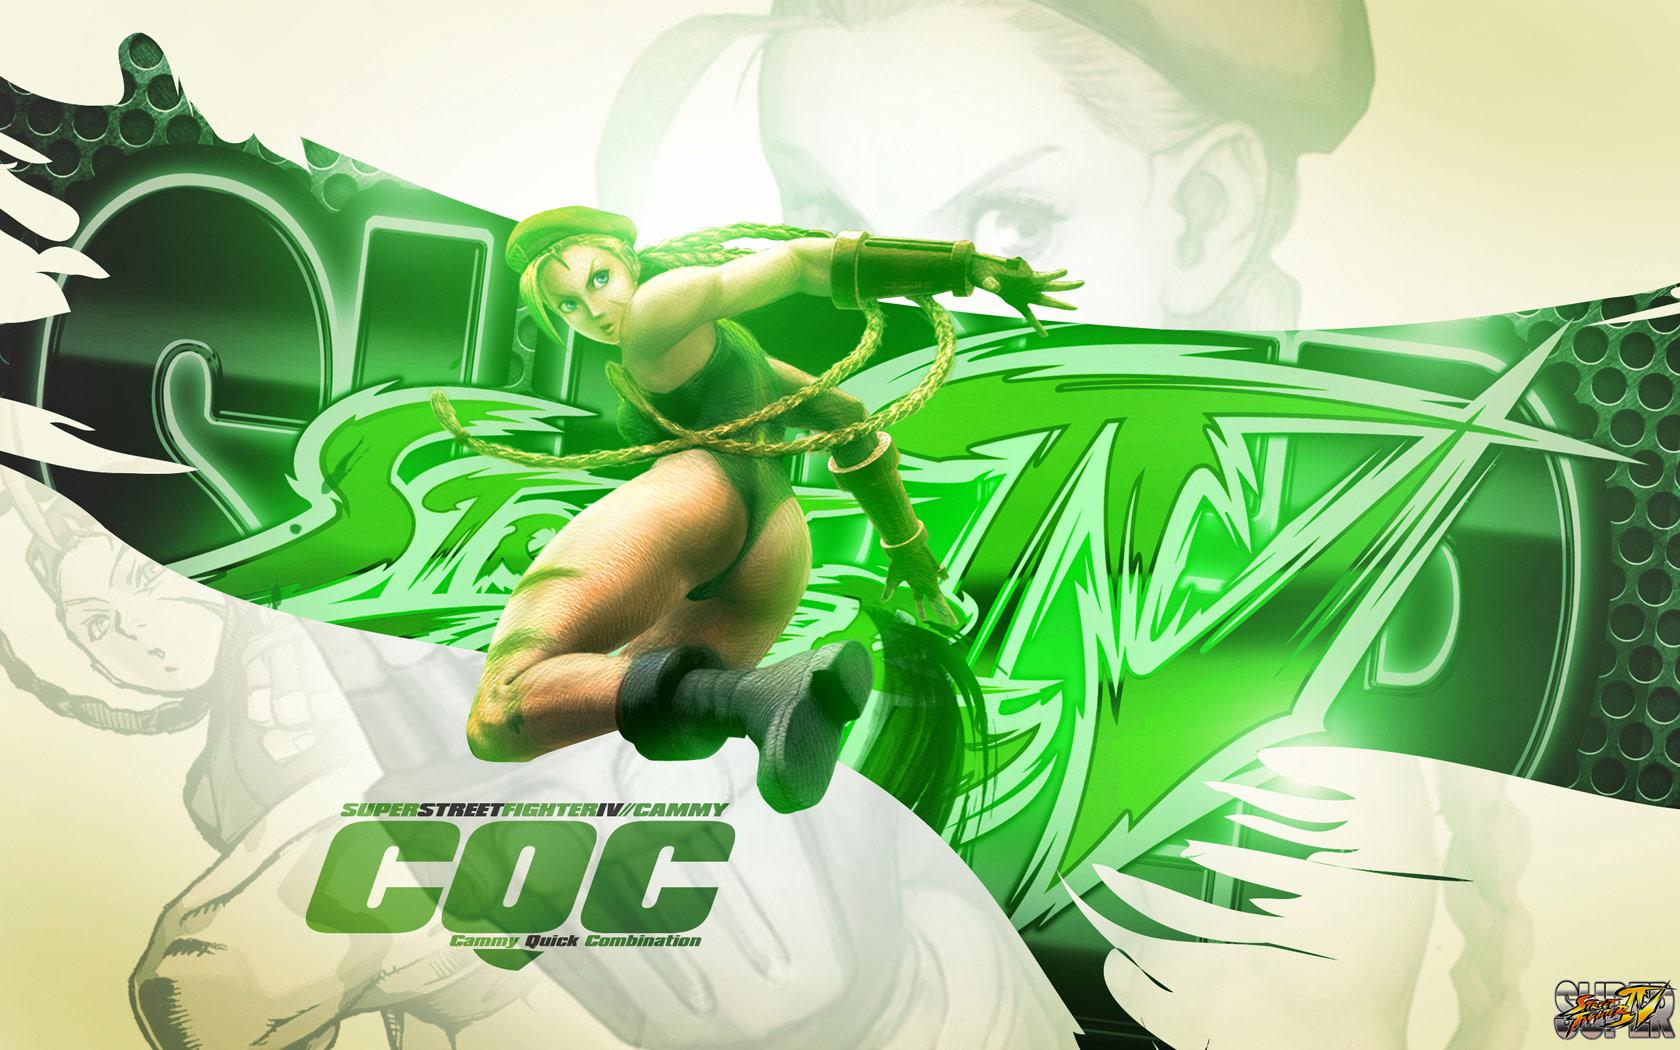 Cammy Super Street Fighter 4 wallpaper by BossLogic